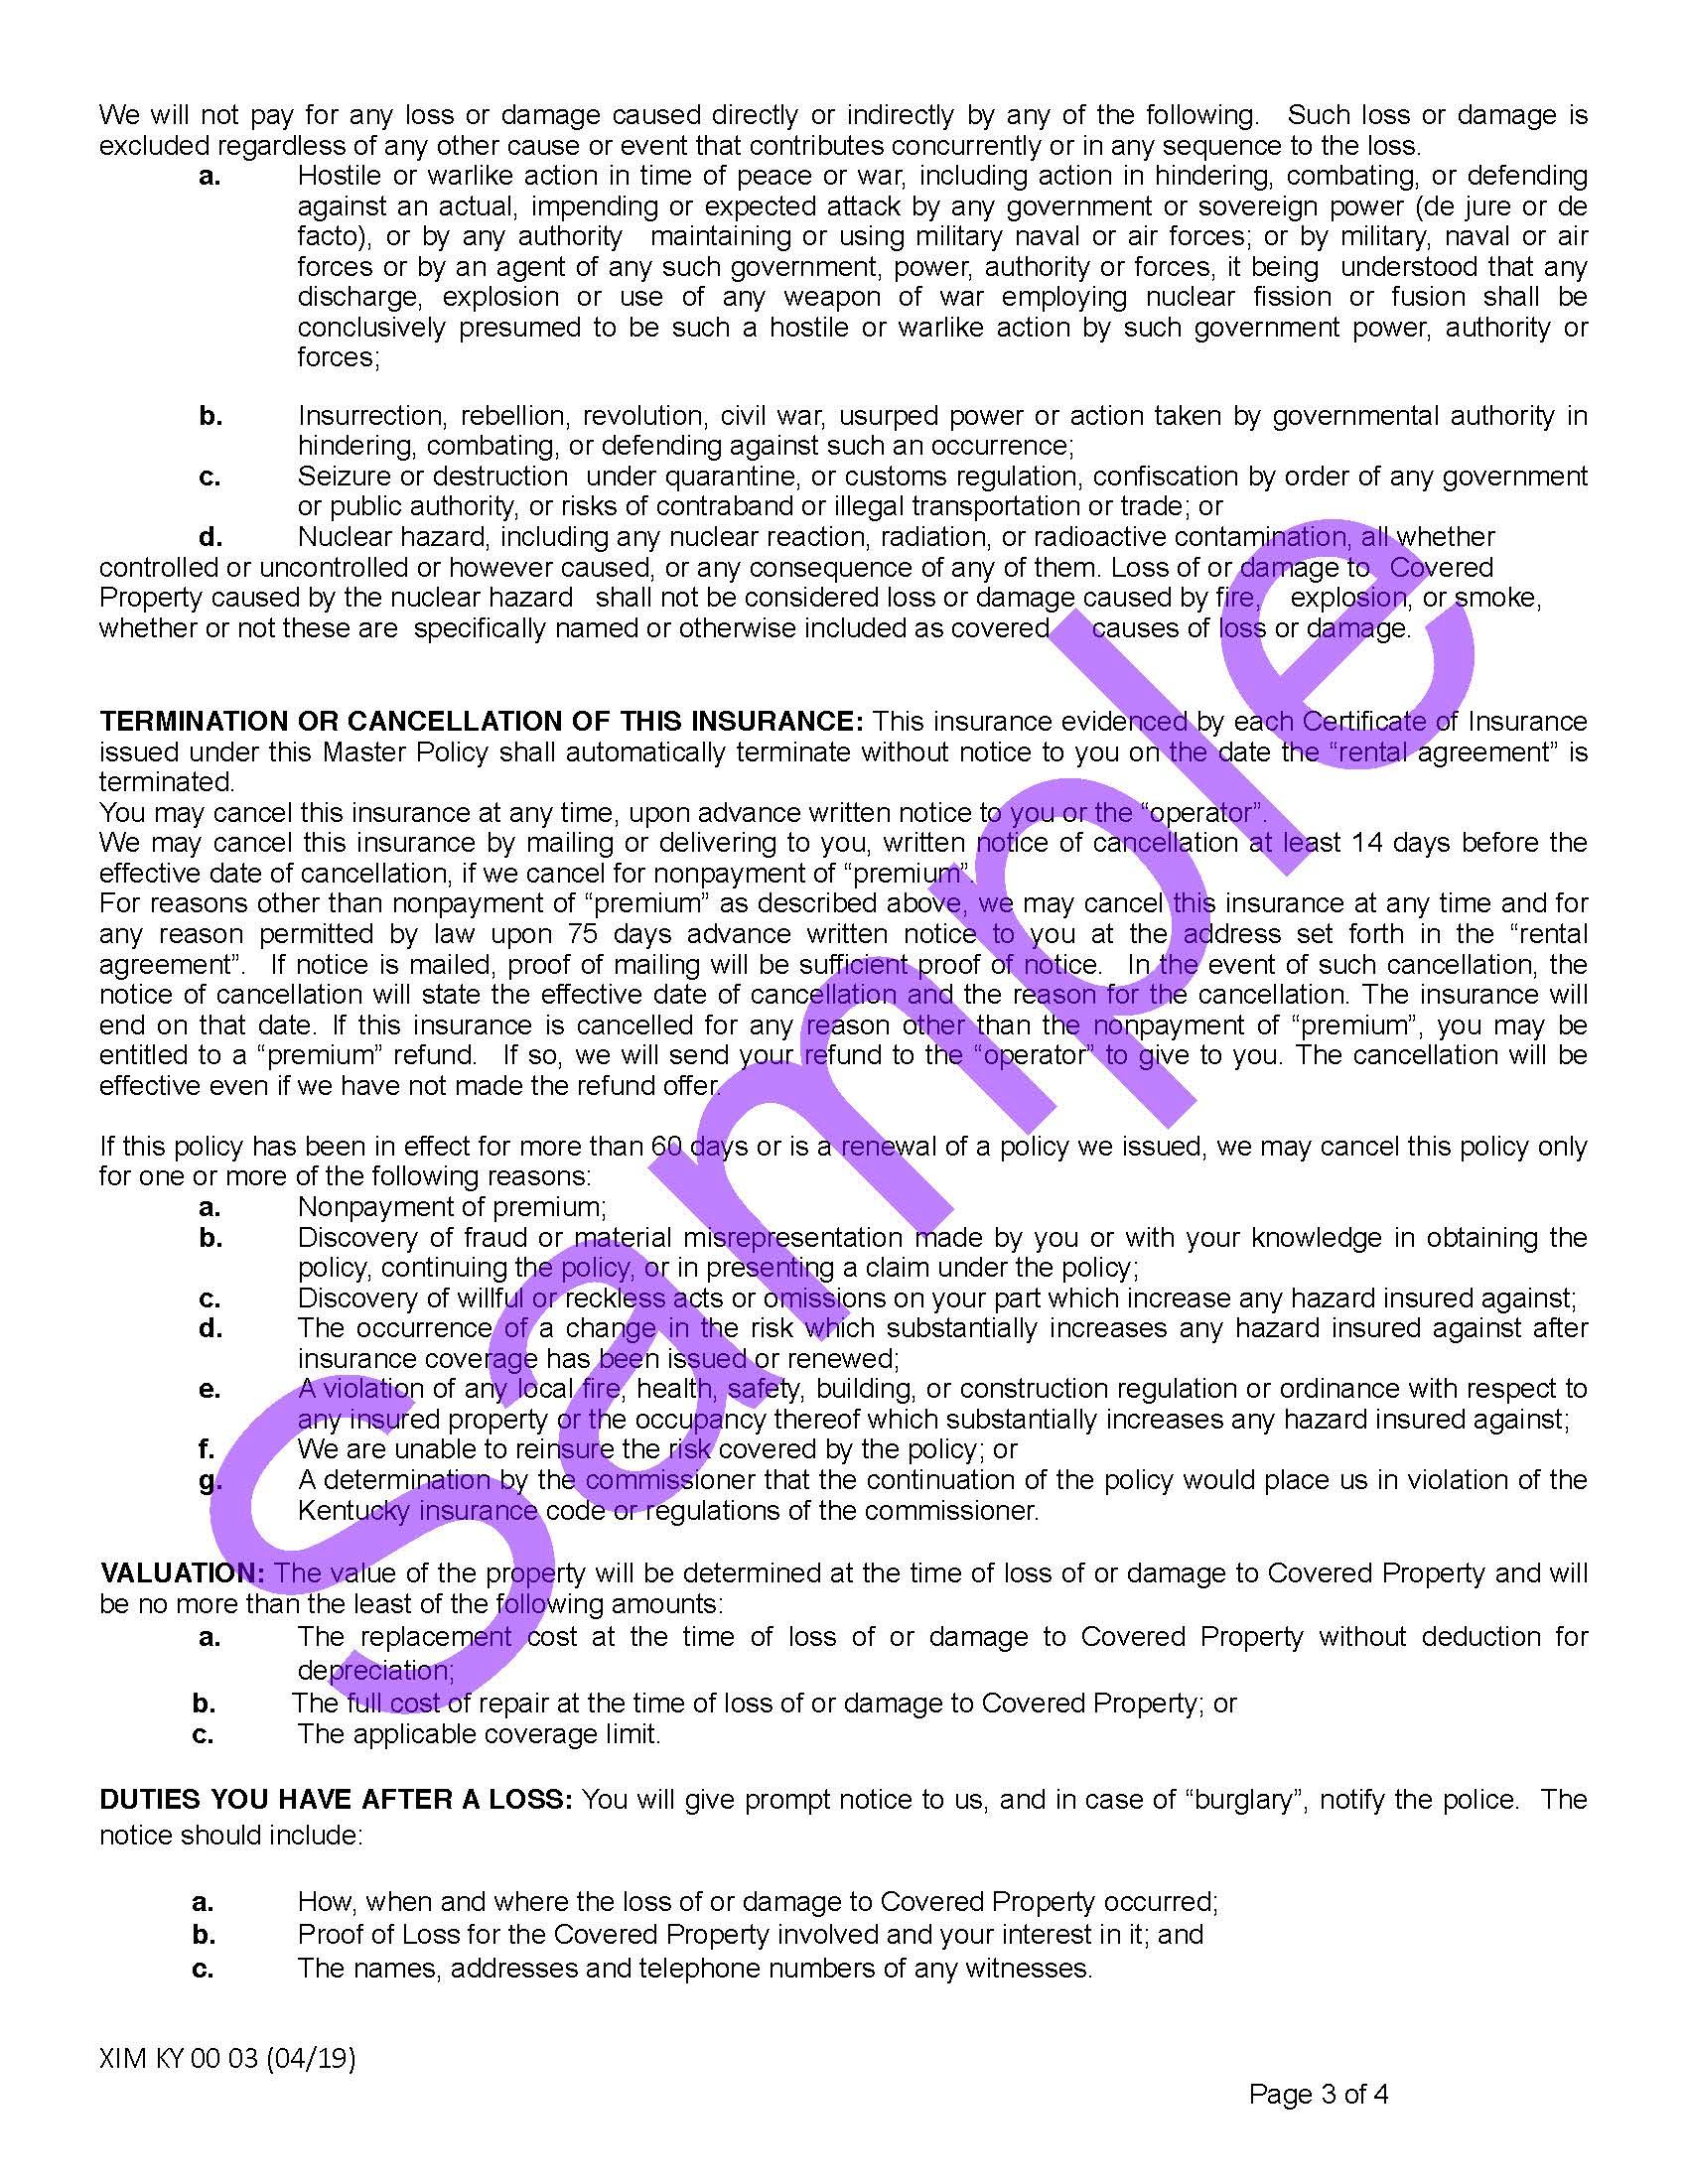 XIM KY 00 03 04 19 Kentucky Certificate of InsuranceSample_Page_3.jpg